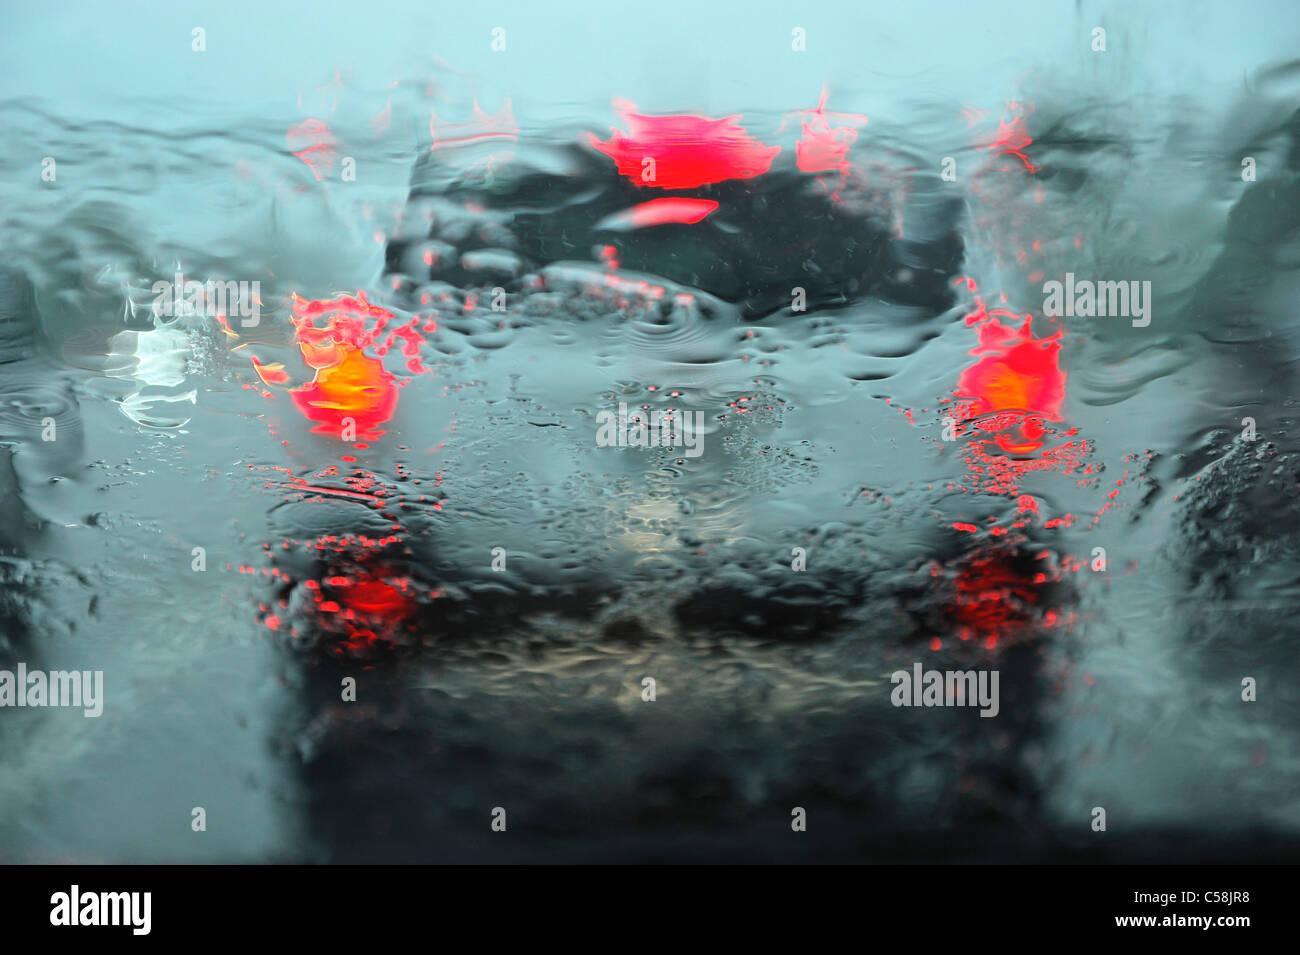 rain, wet, car, windshield, Naples, Florida, USA, United States, America, window, lights, visibility - Stock Image